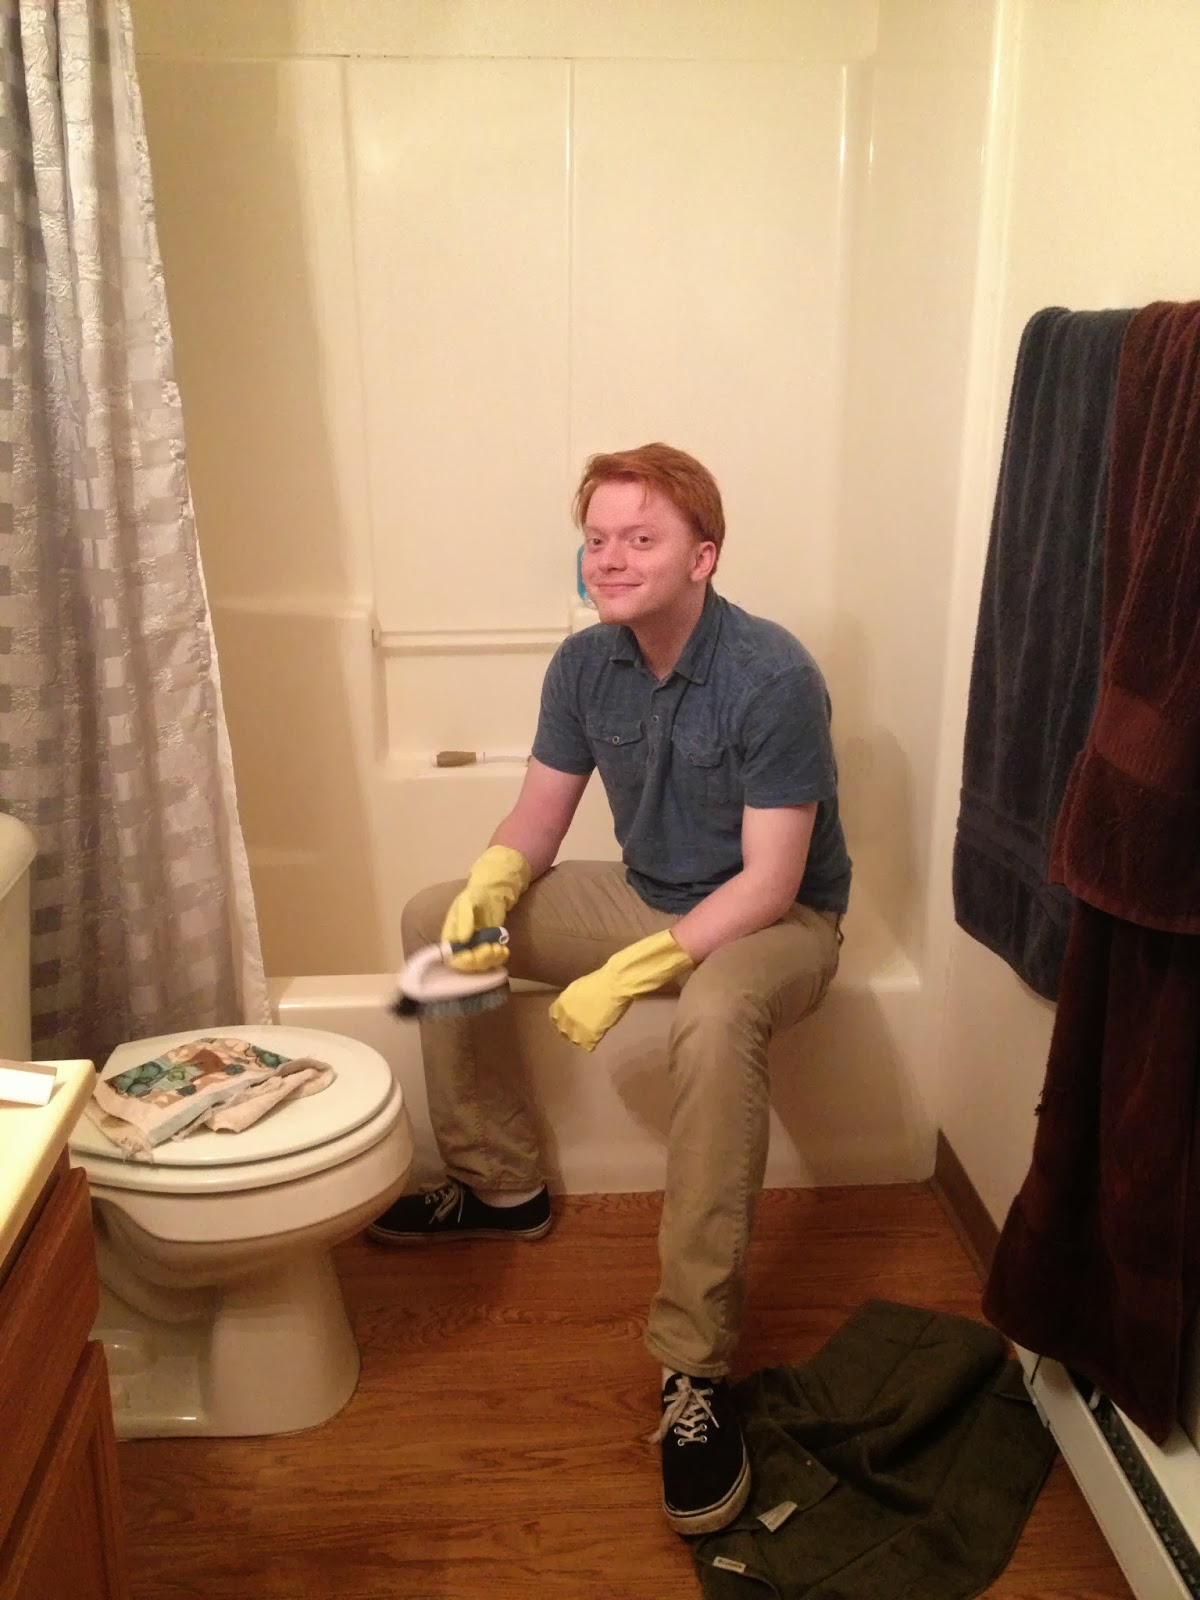 Jeff Cleaning Bathtub